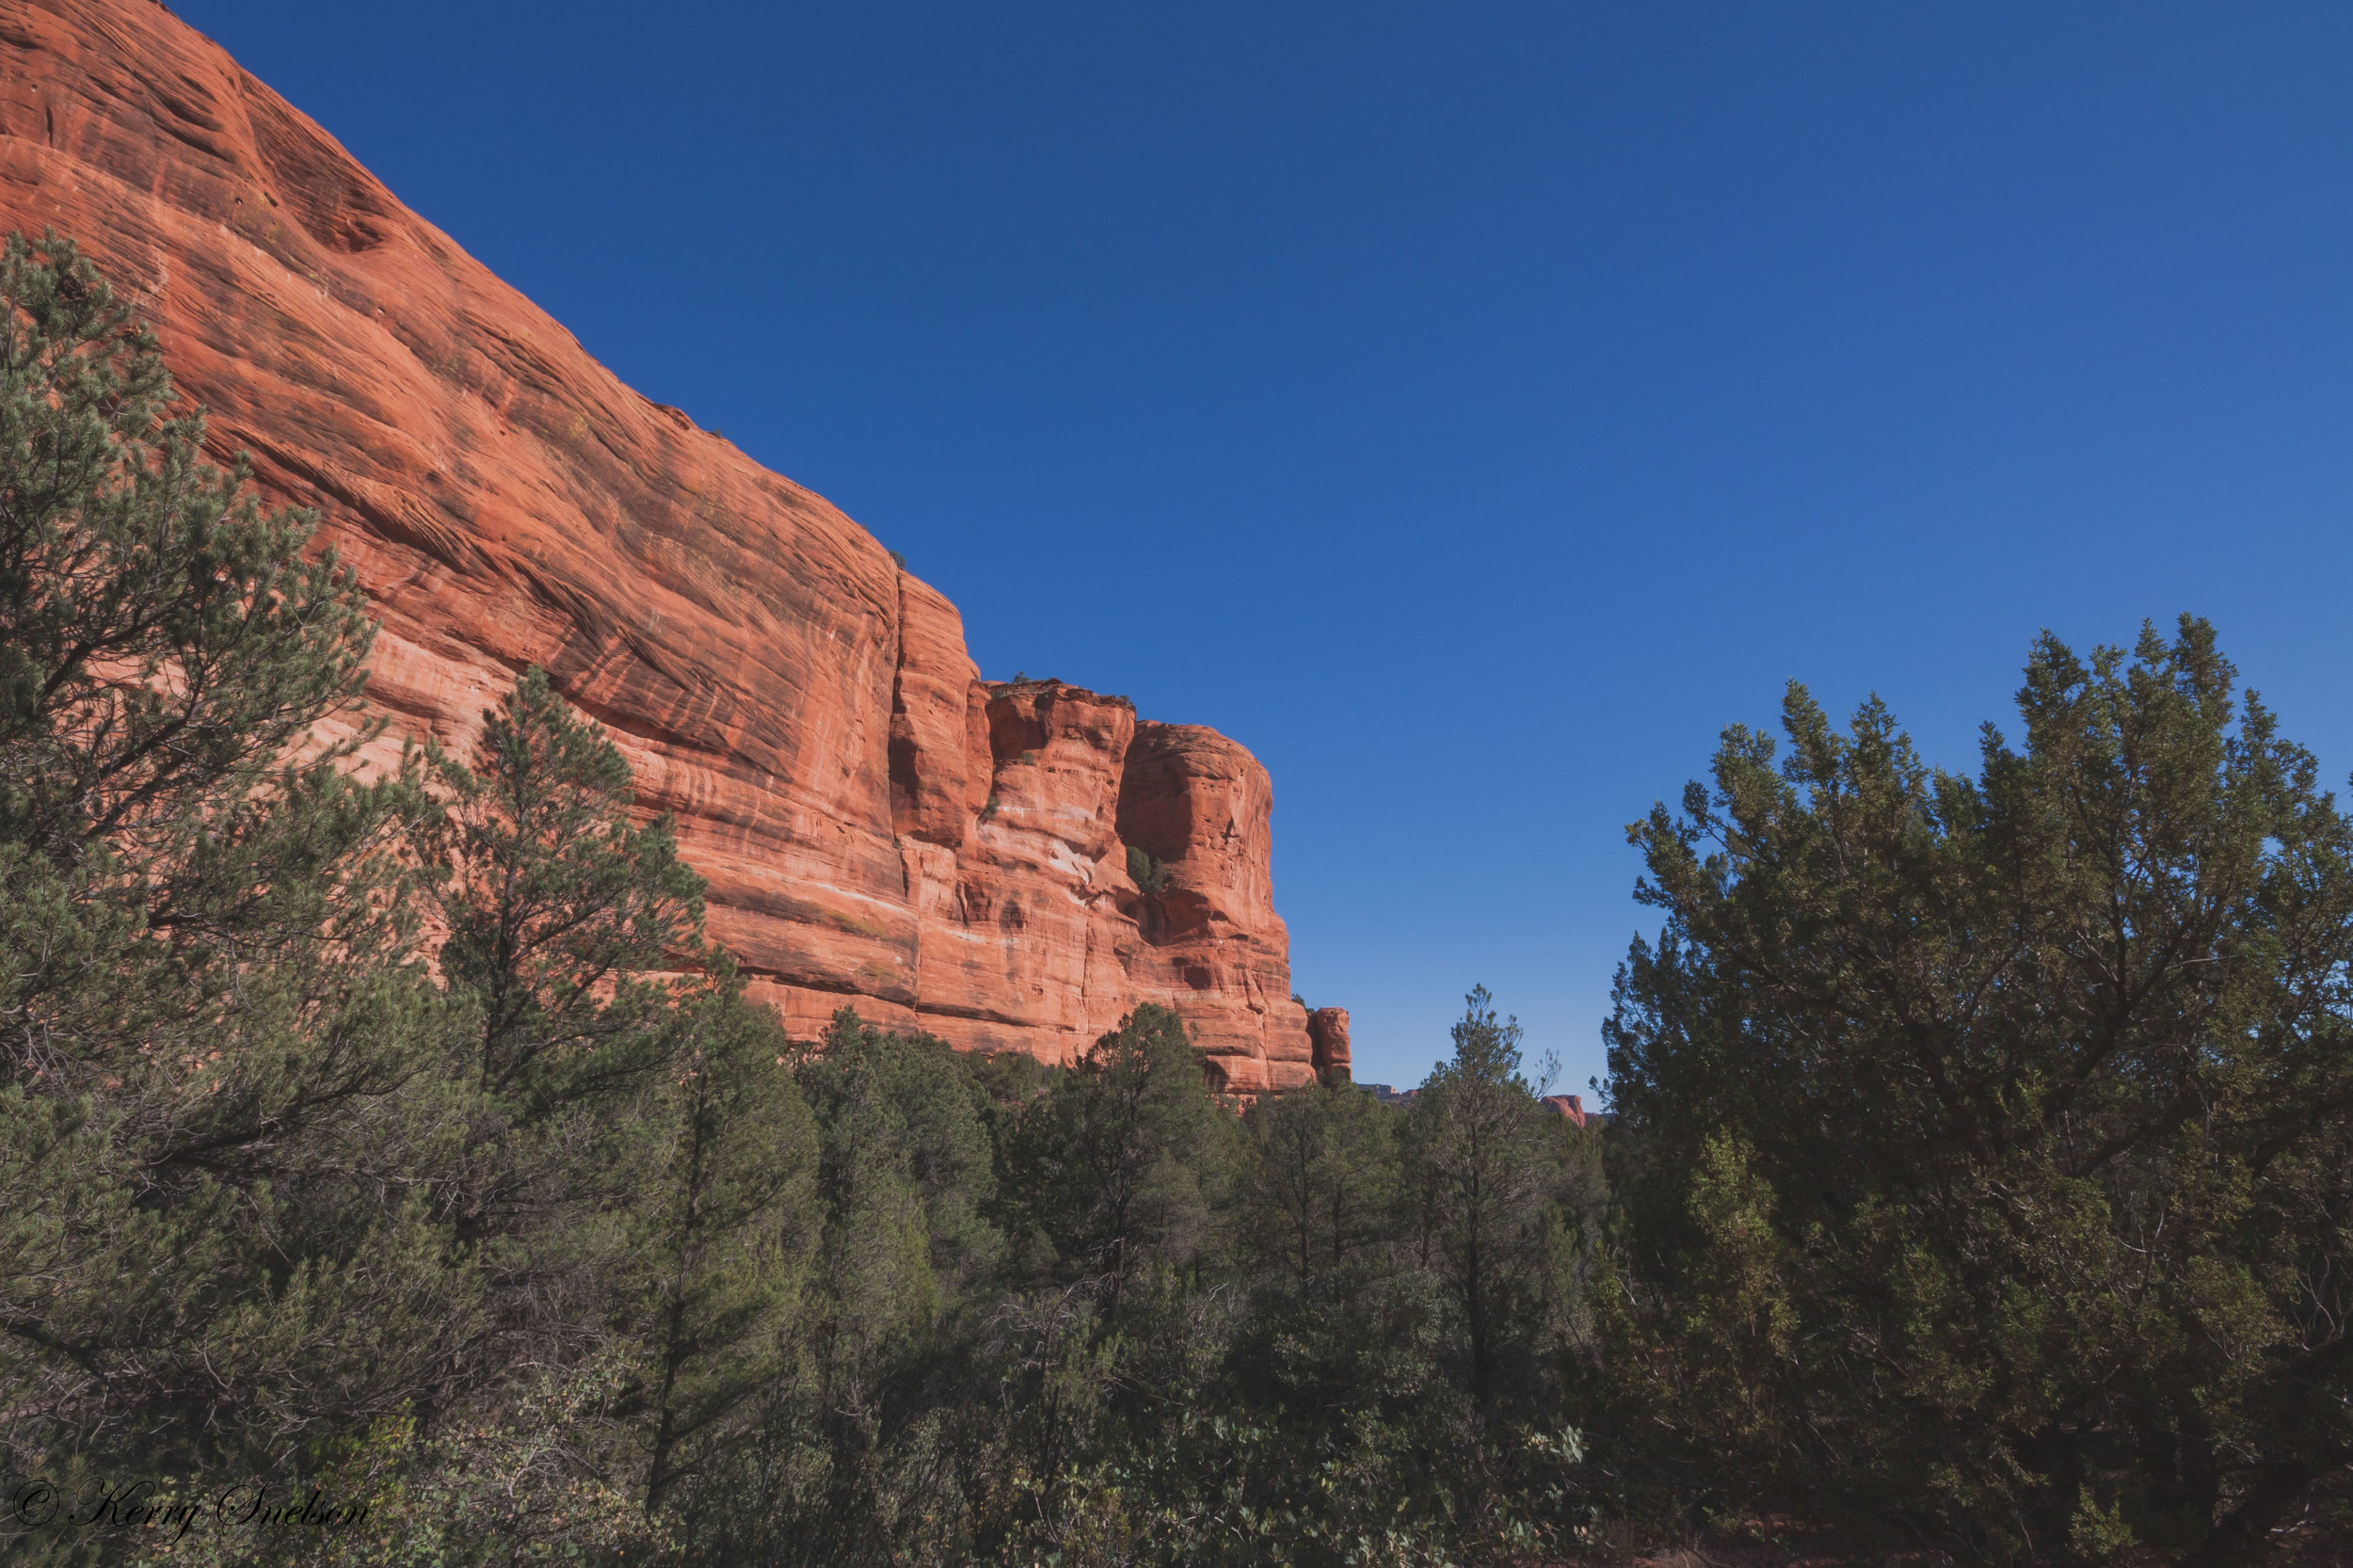 Red Rock Cliff Landscape